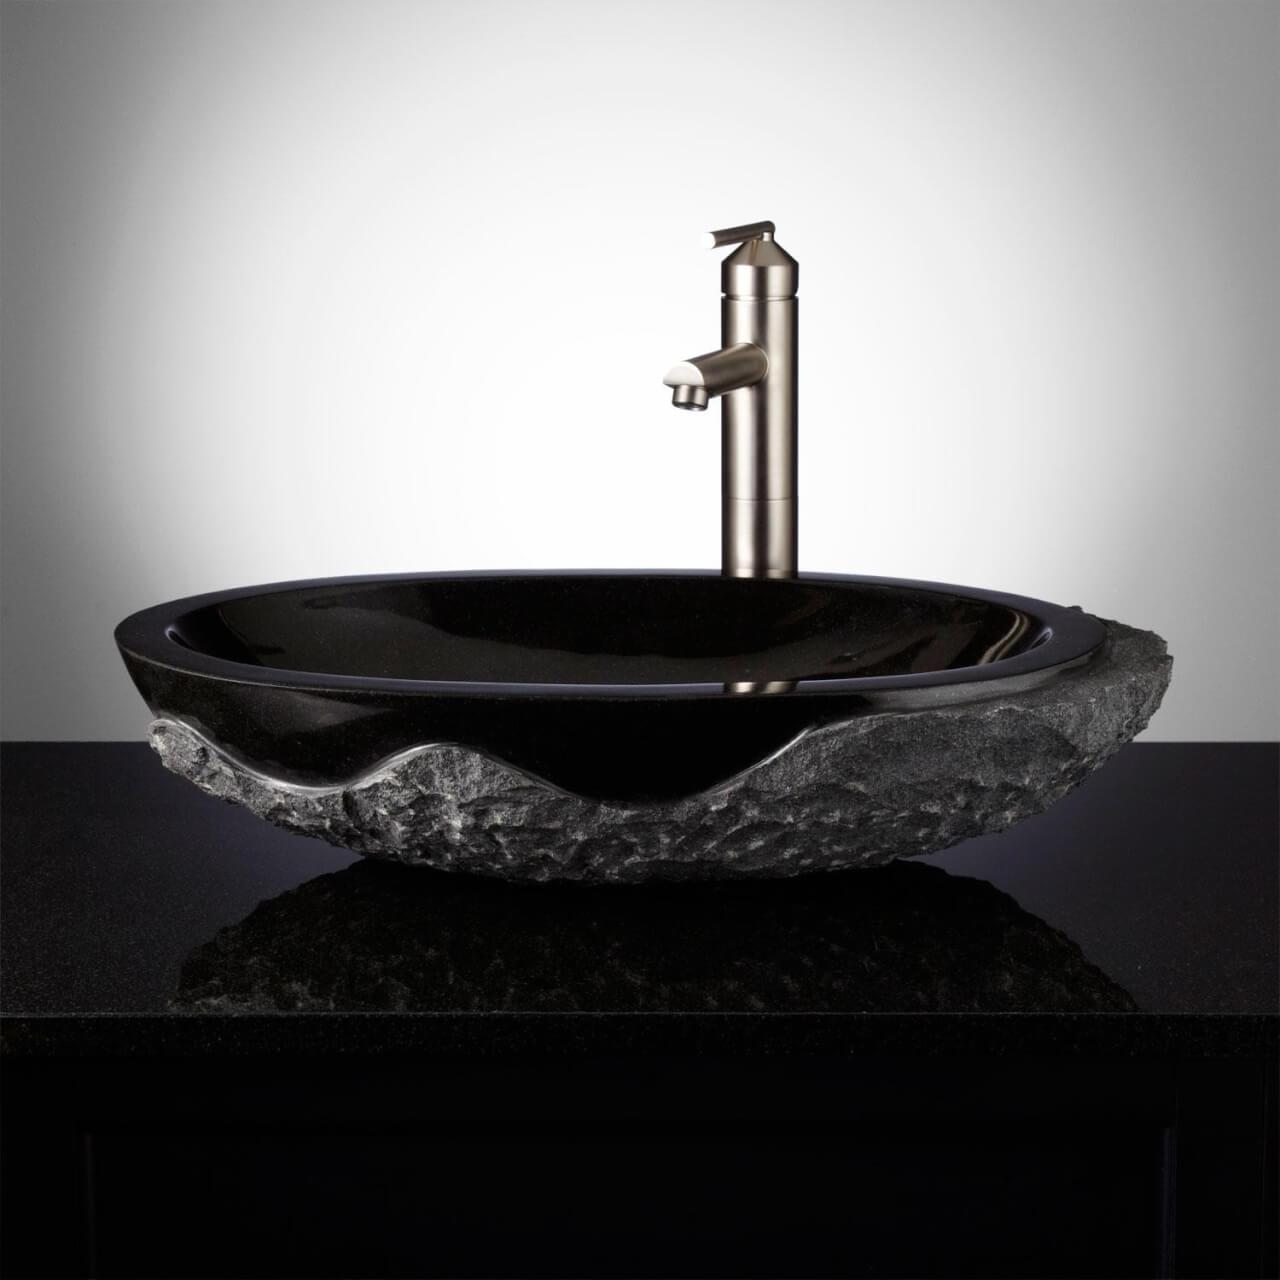 Image Result For Coloured Bathroom Sinks